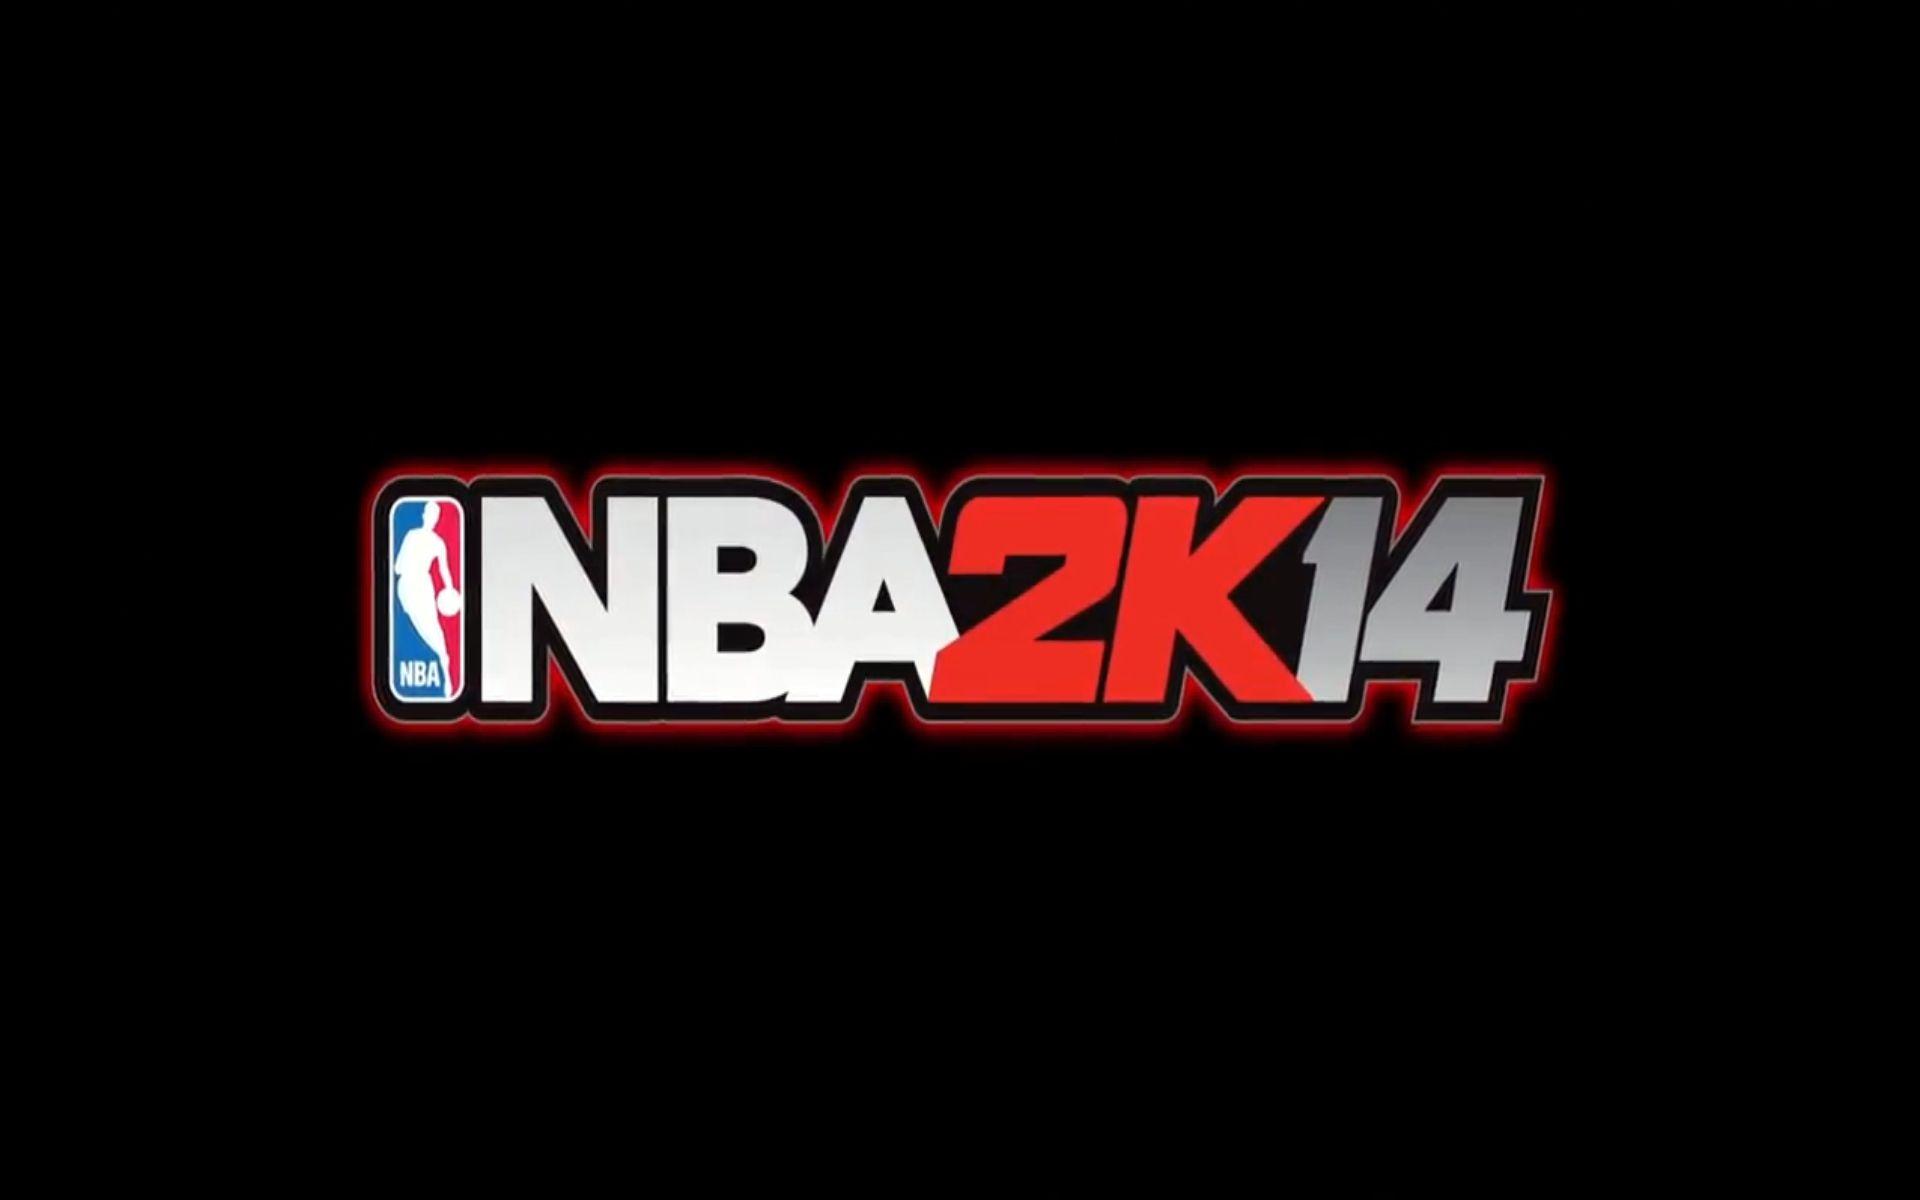 https://in.gamerekon.com/wp-content/uploads/2013/07/NBA-2K14.jpg